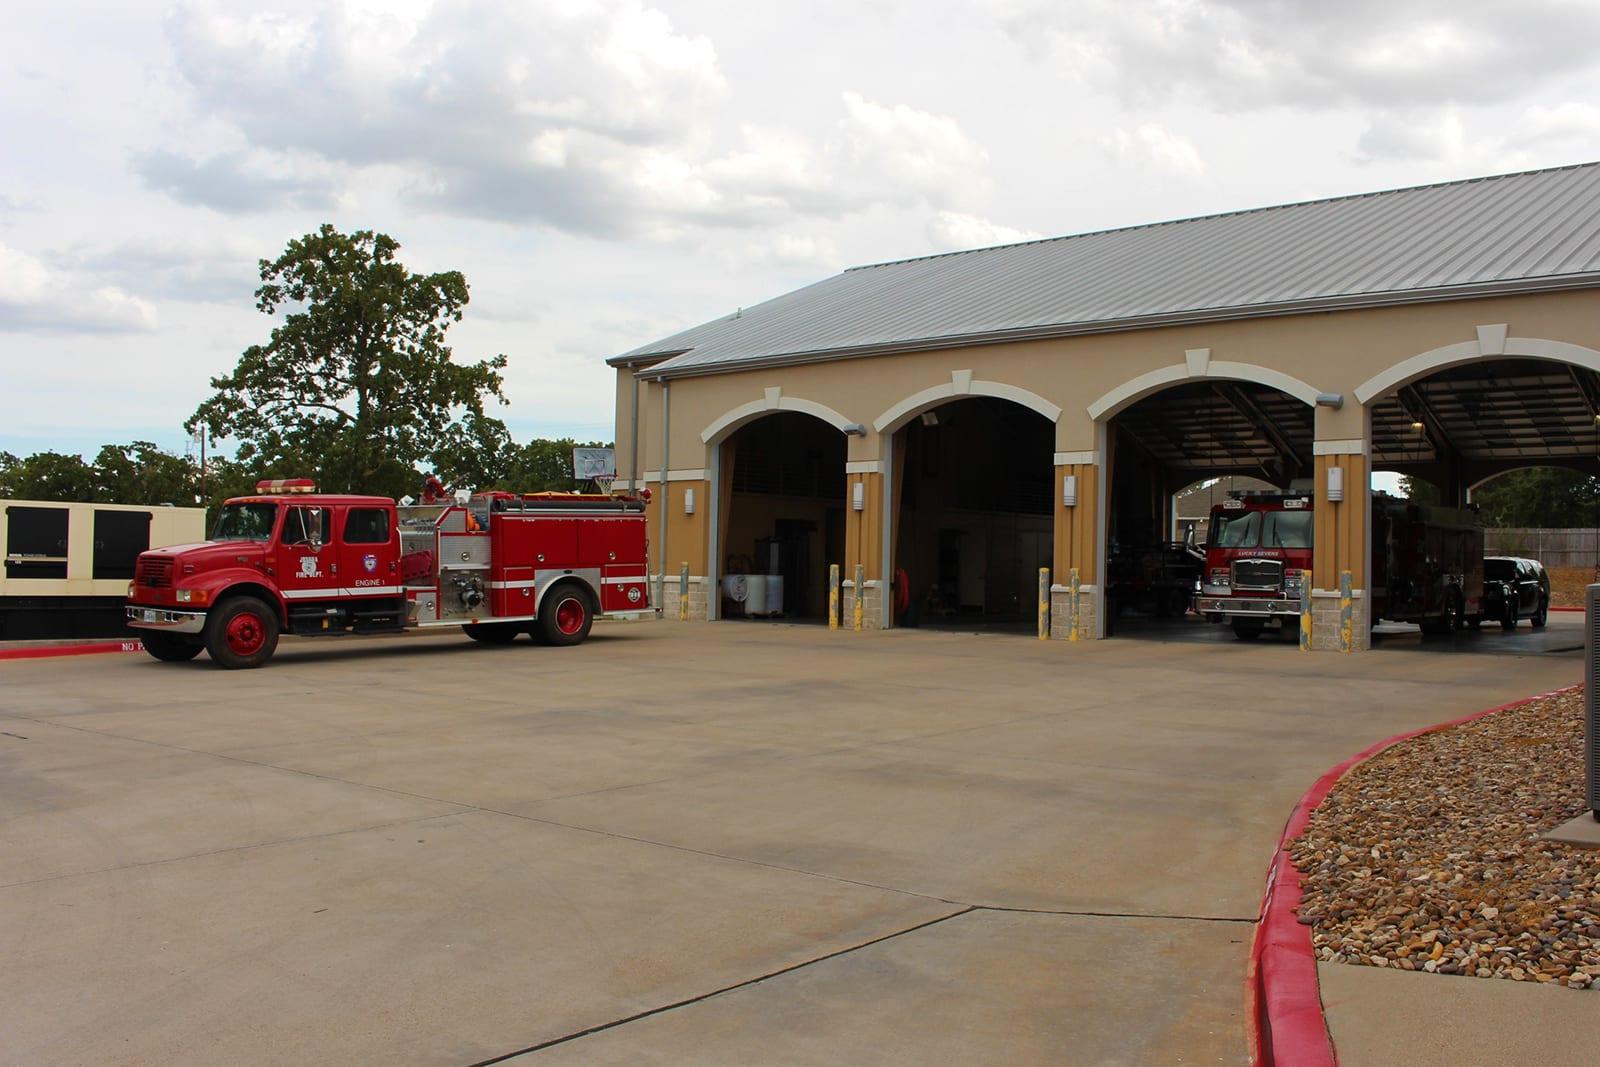 Texas Fire academy trucks